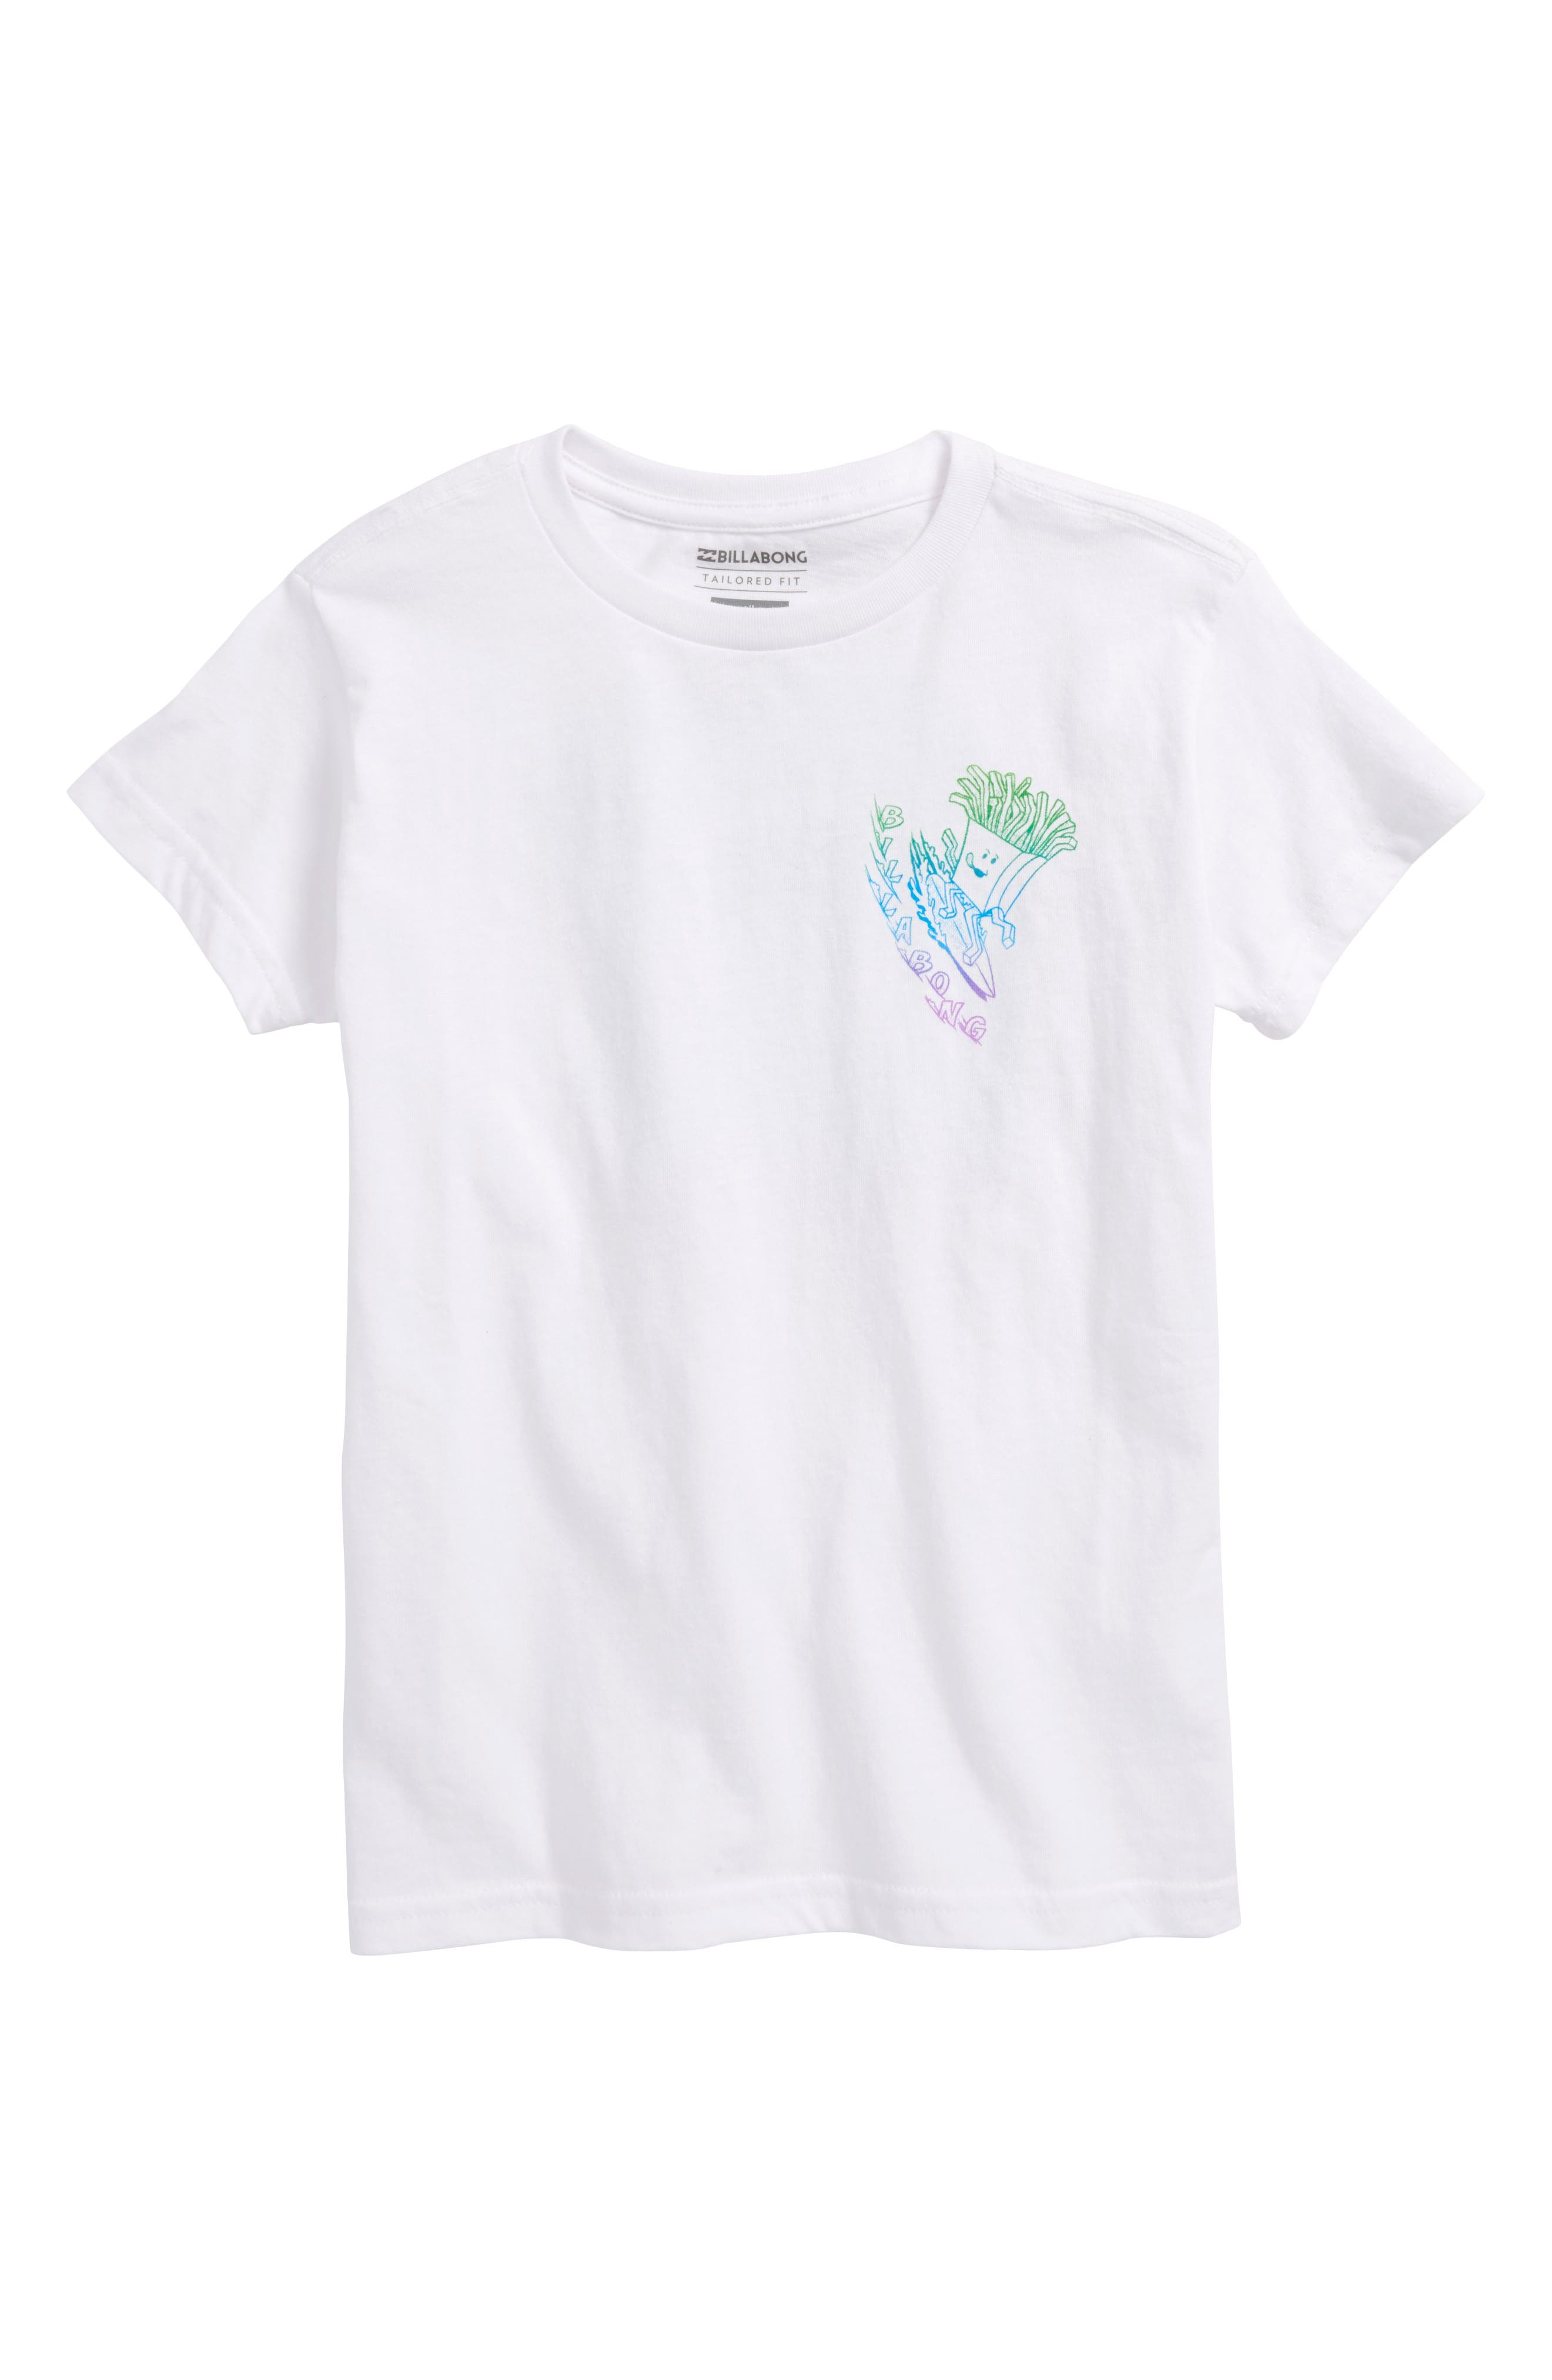 Snacks & Shacks Graphic T-Shirt,                         Main,                         color,